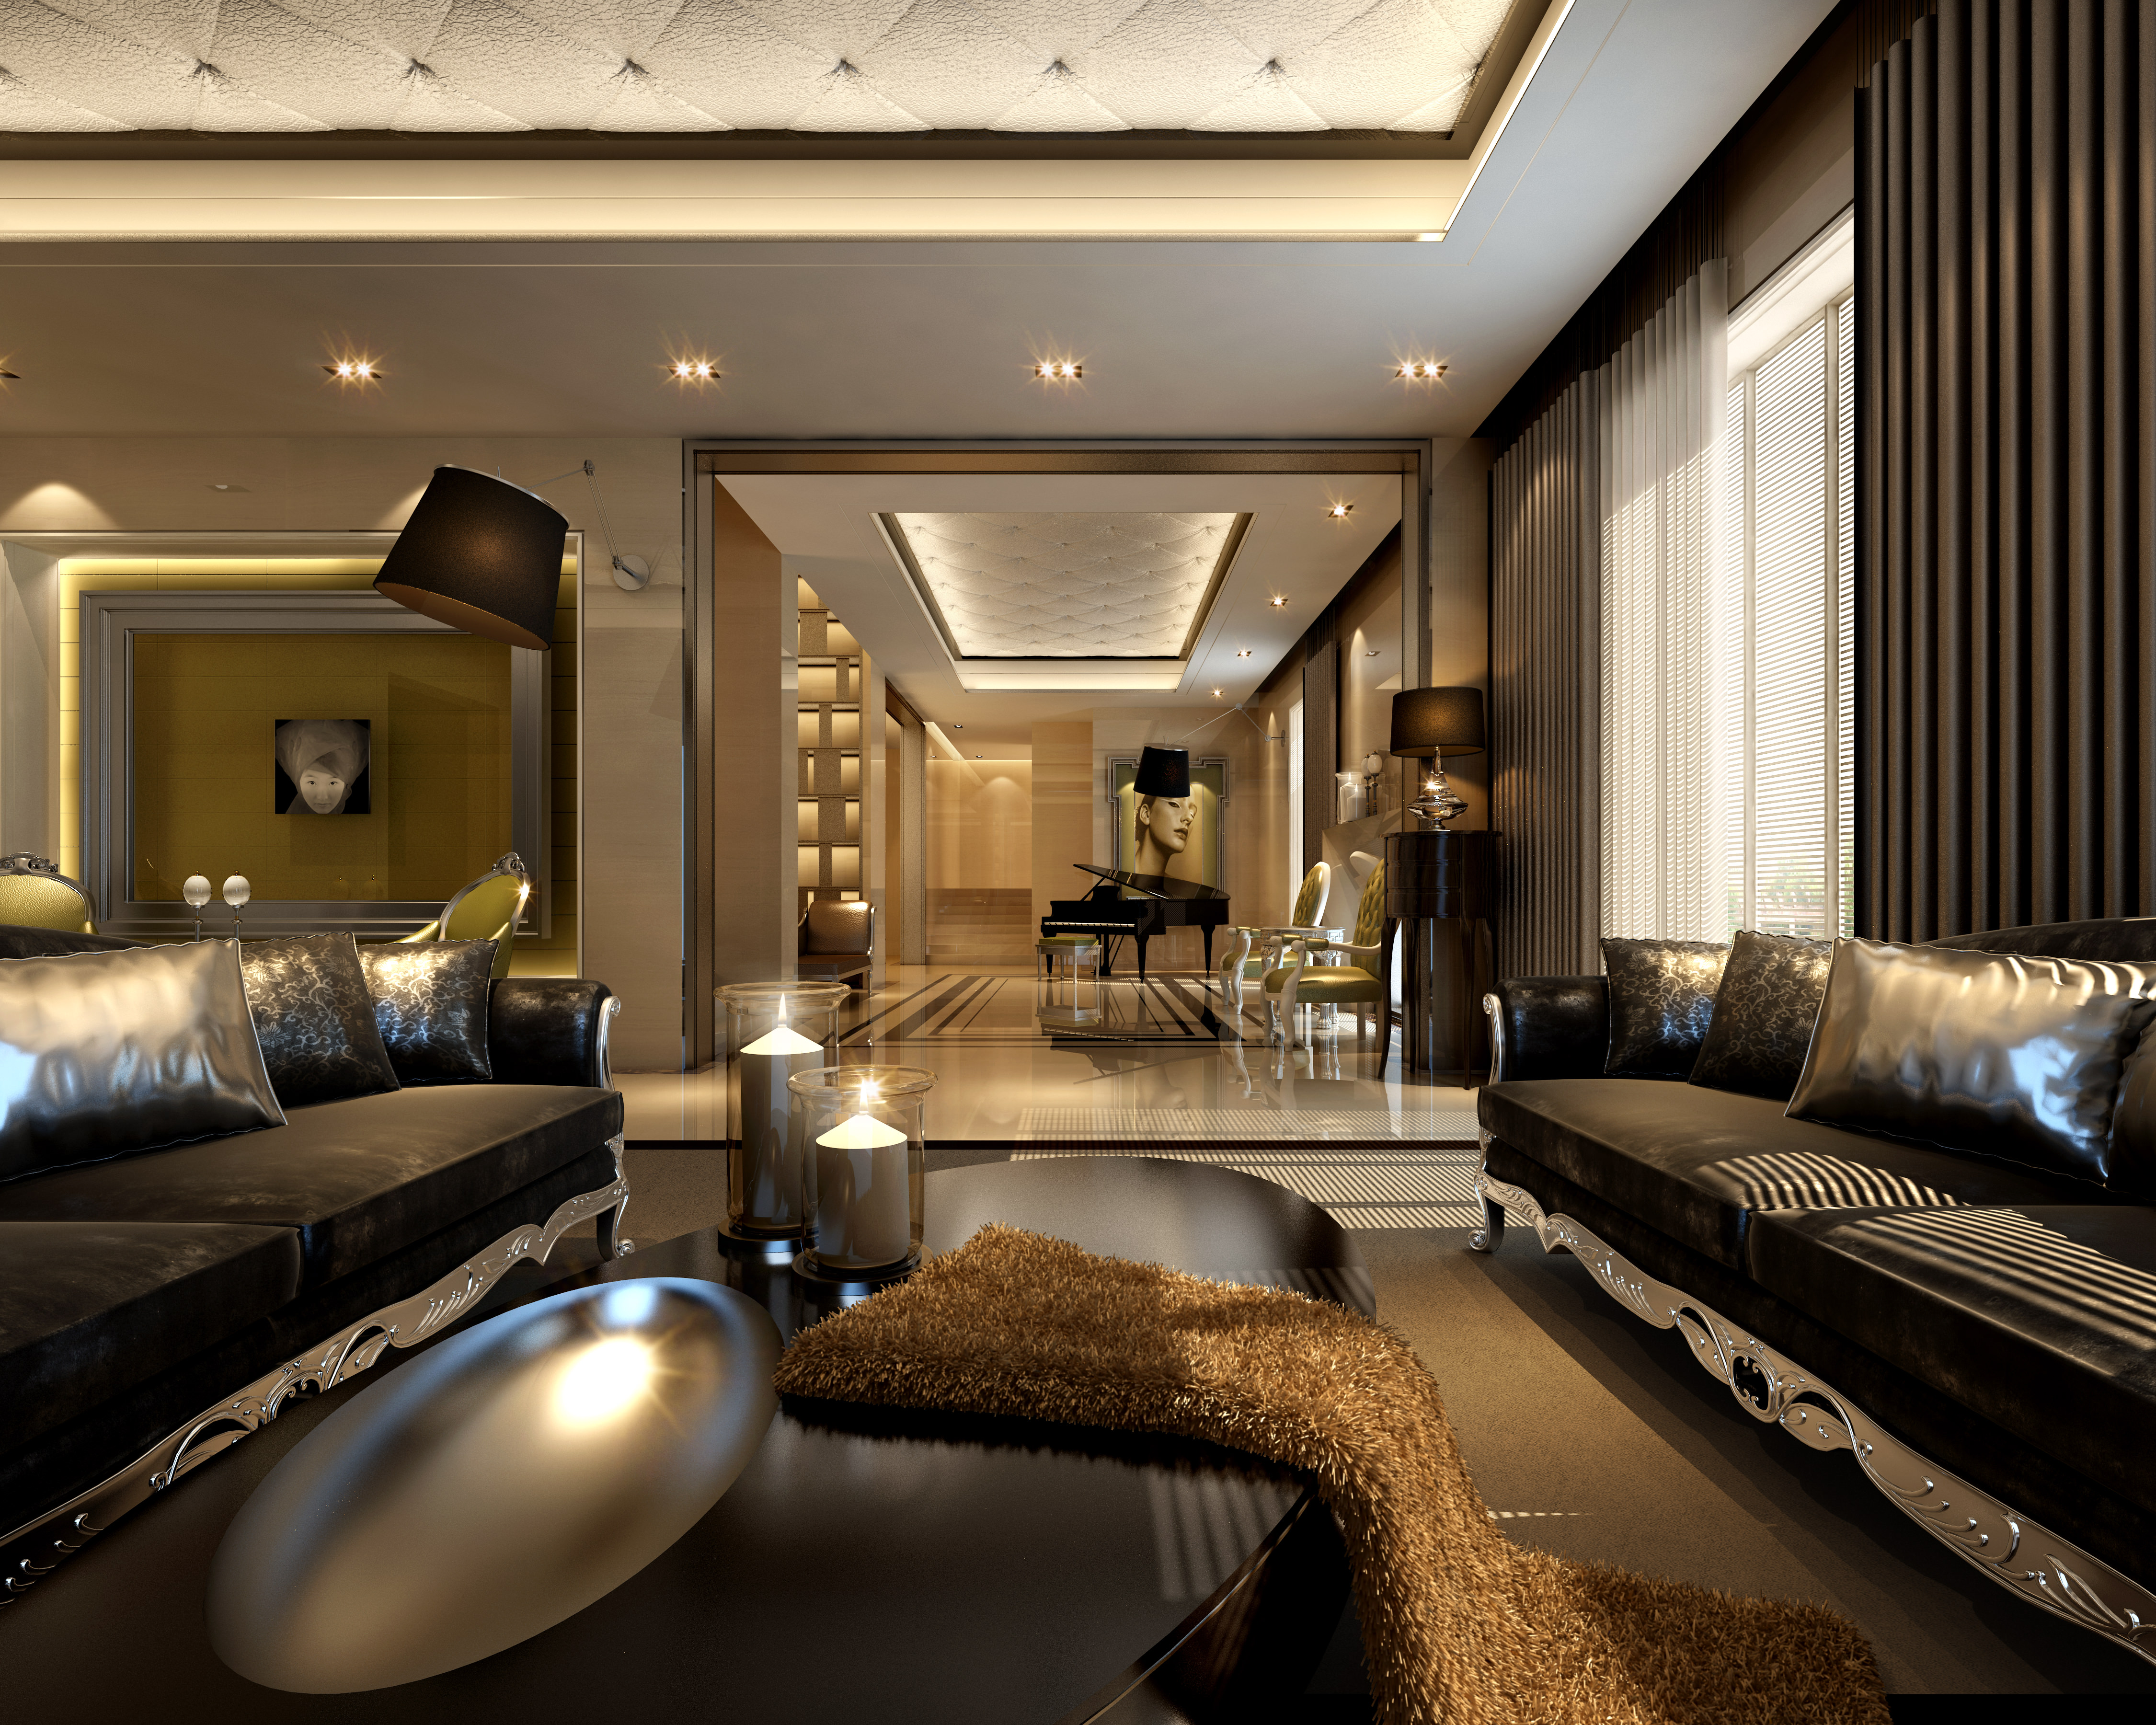 design living room 3d Maribointelligentsolutionsco